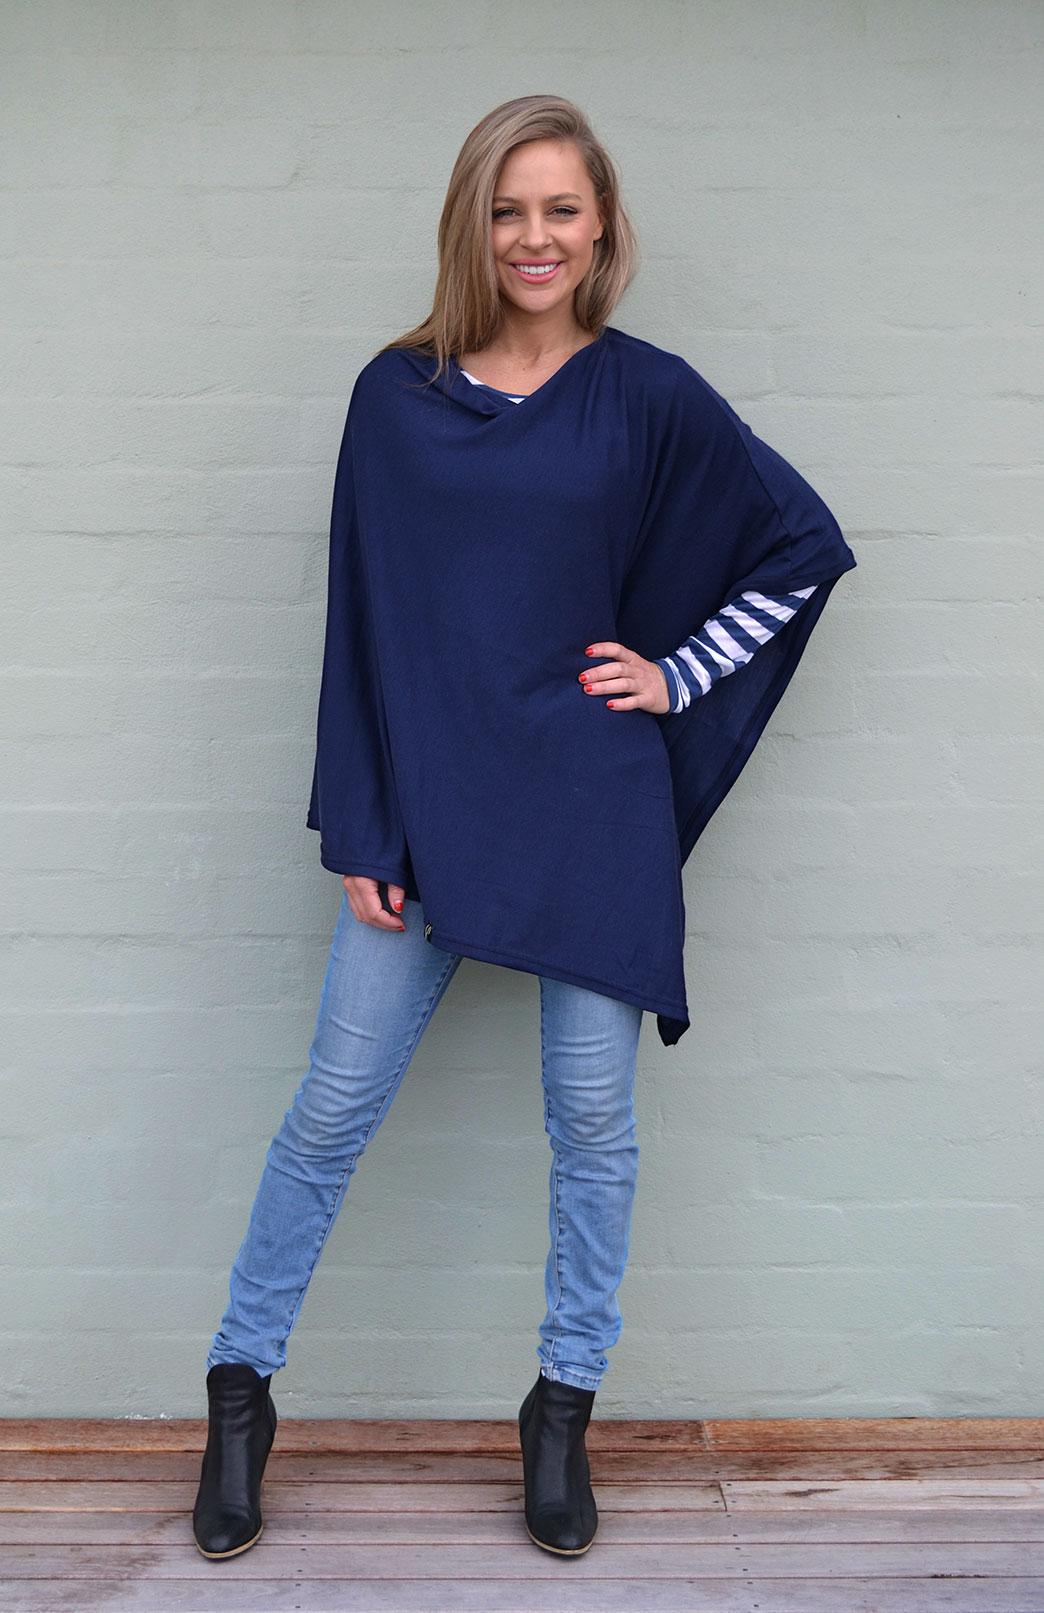 Classic Poncho - Plain - Women's Merino Wool Classic Lightweight Poncho - Smitten Merino Tasmania Australia